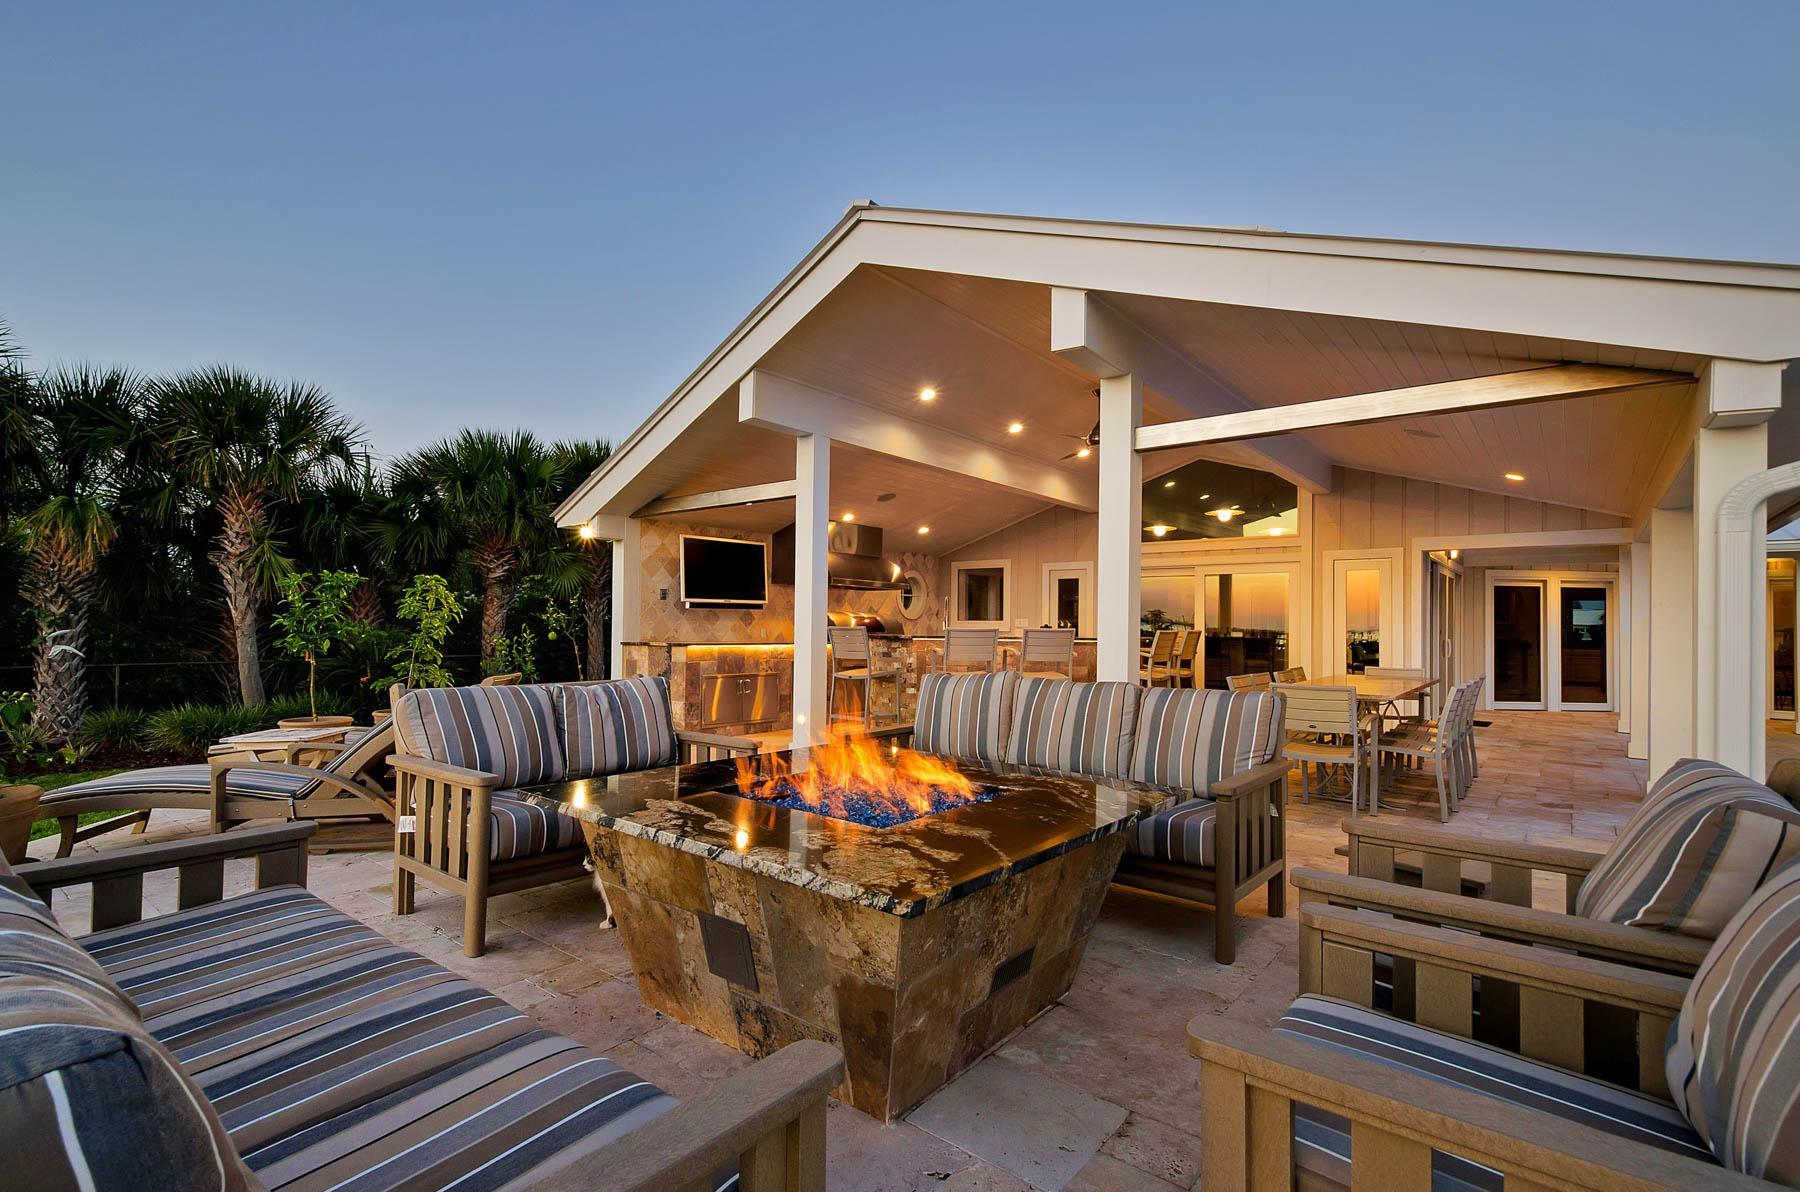 kitchen remodel jacksonville fl center island florida ranch retreat - bontrager builders group